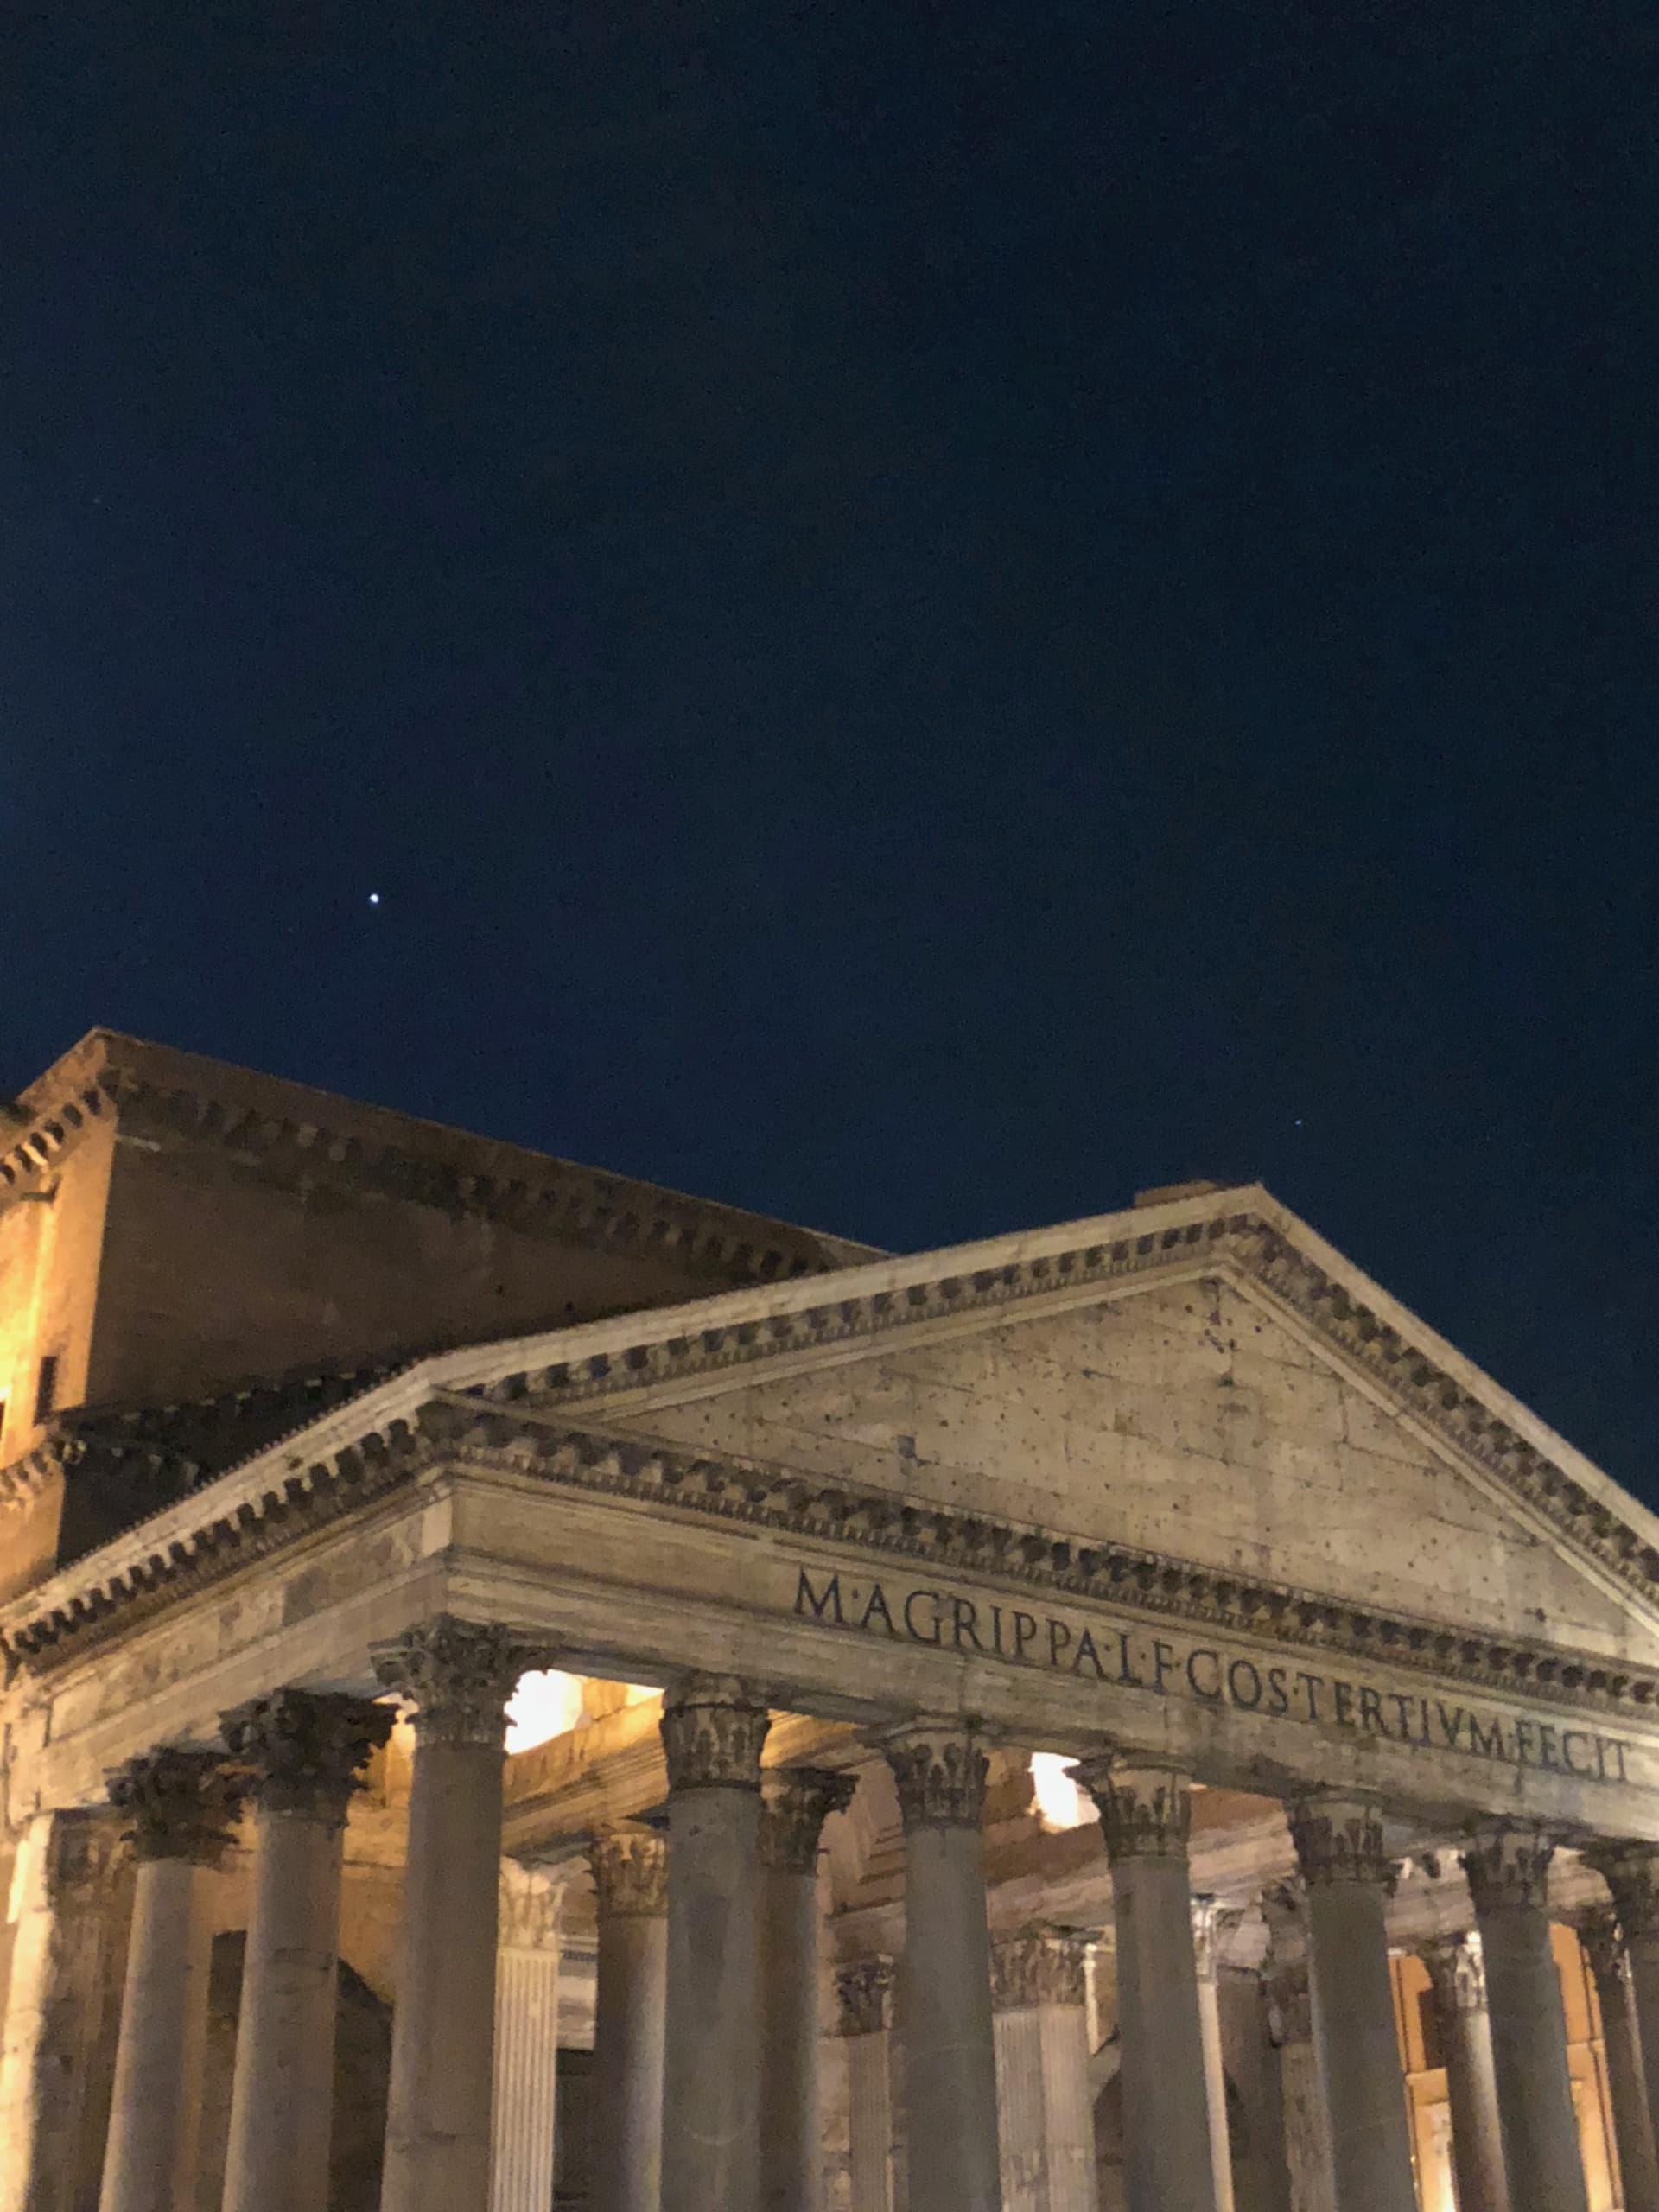 Jupiter over the Pantheon